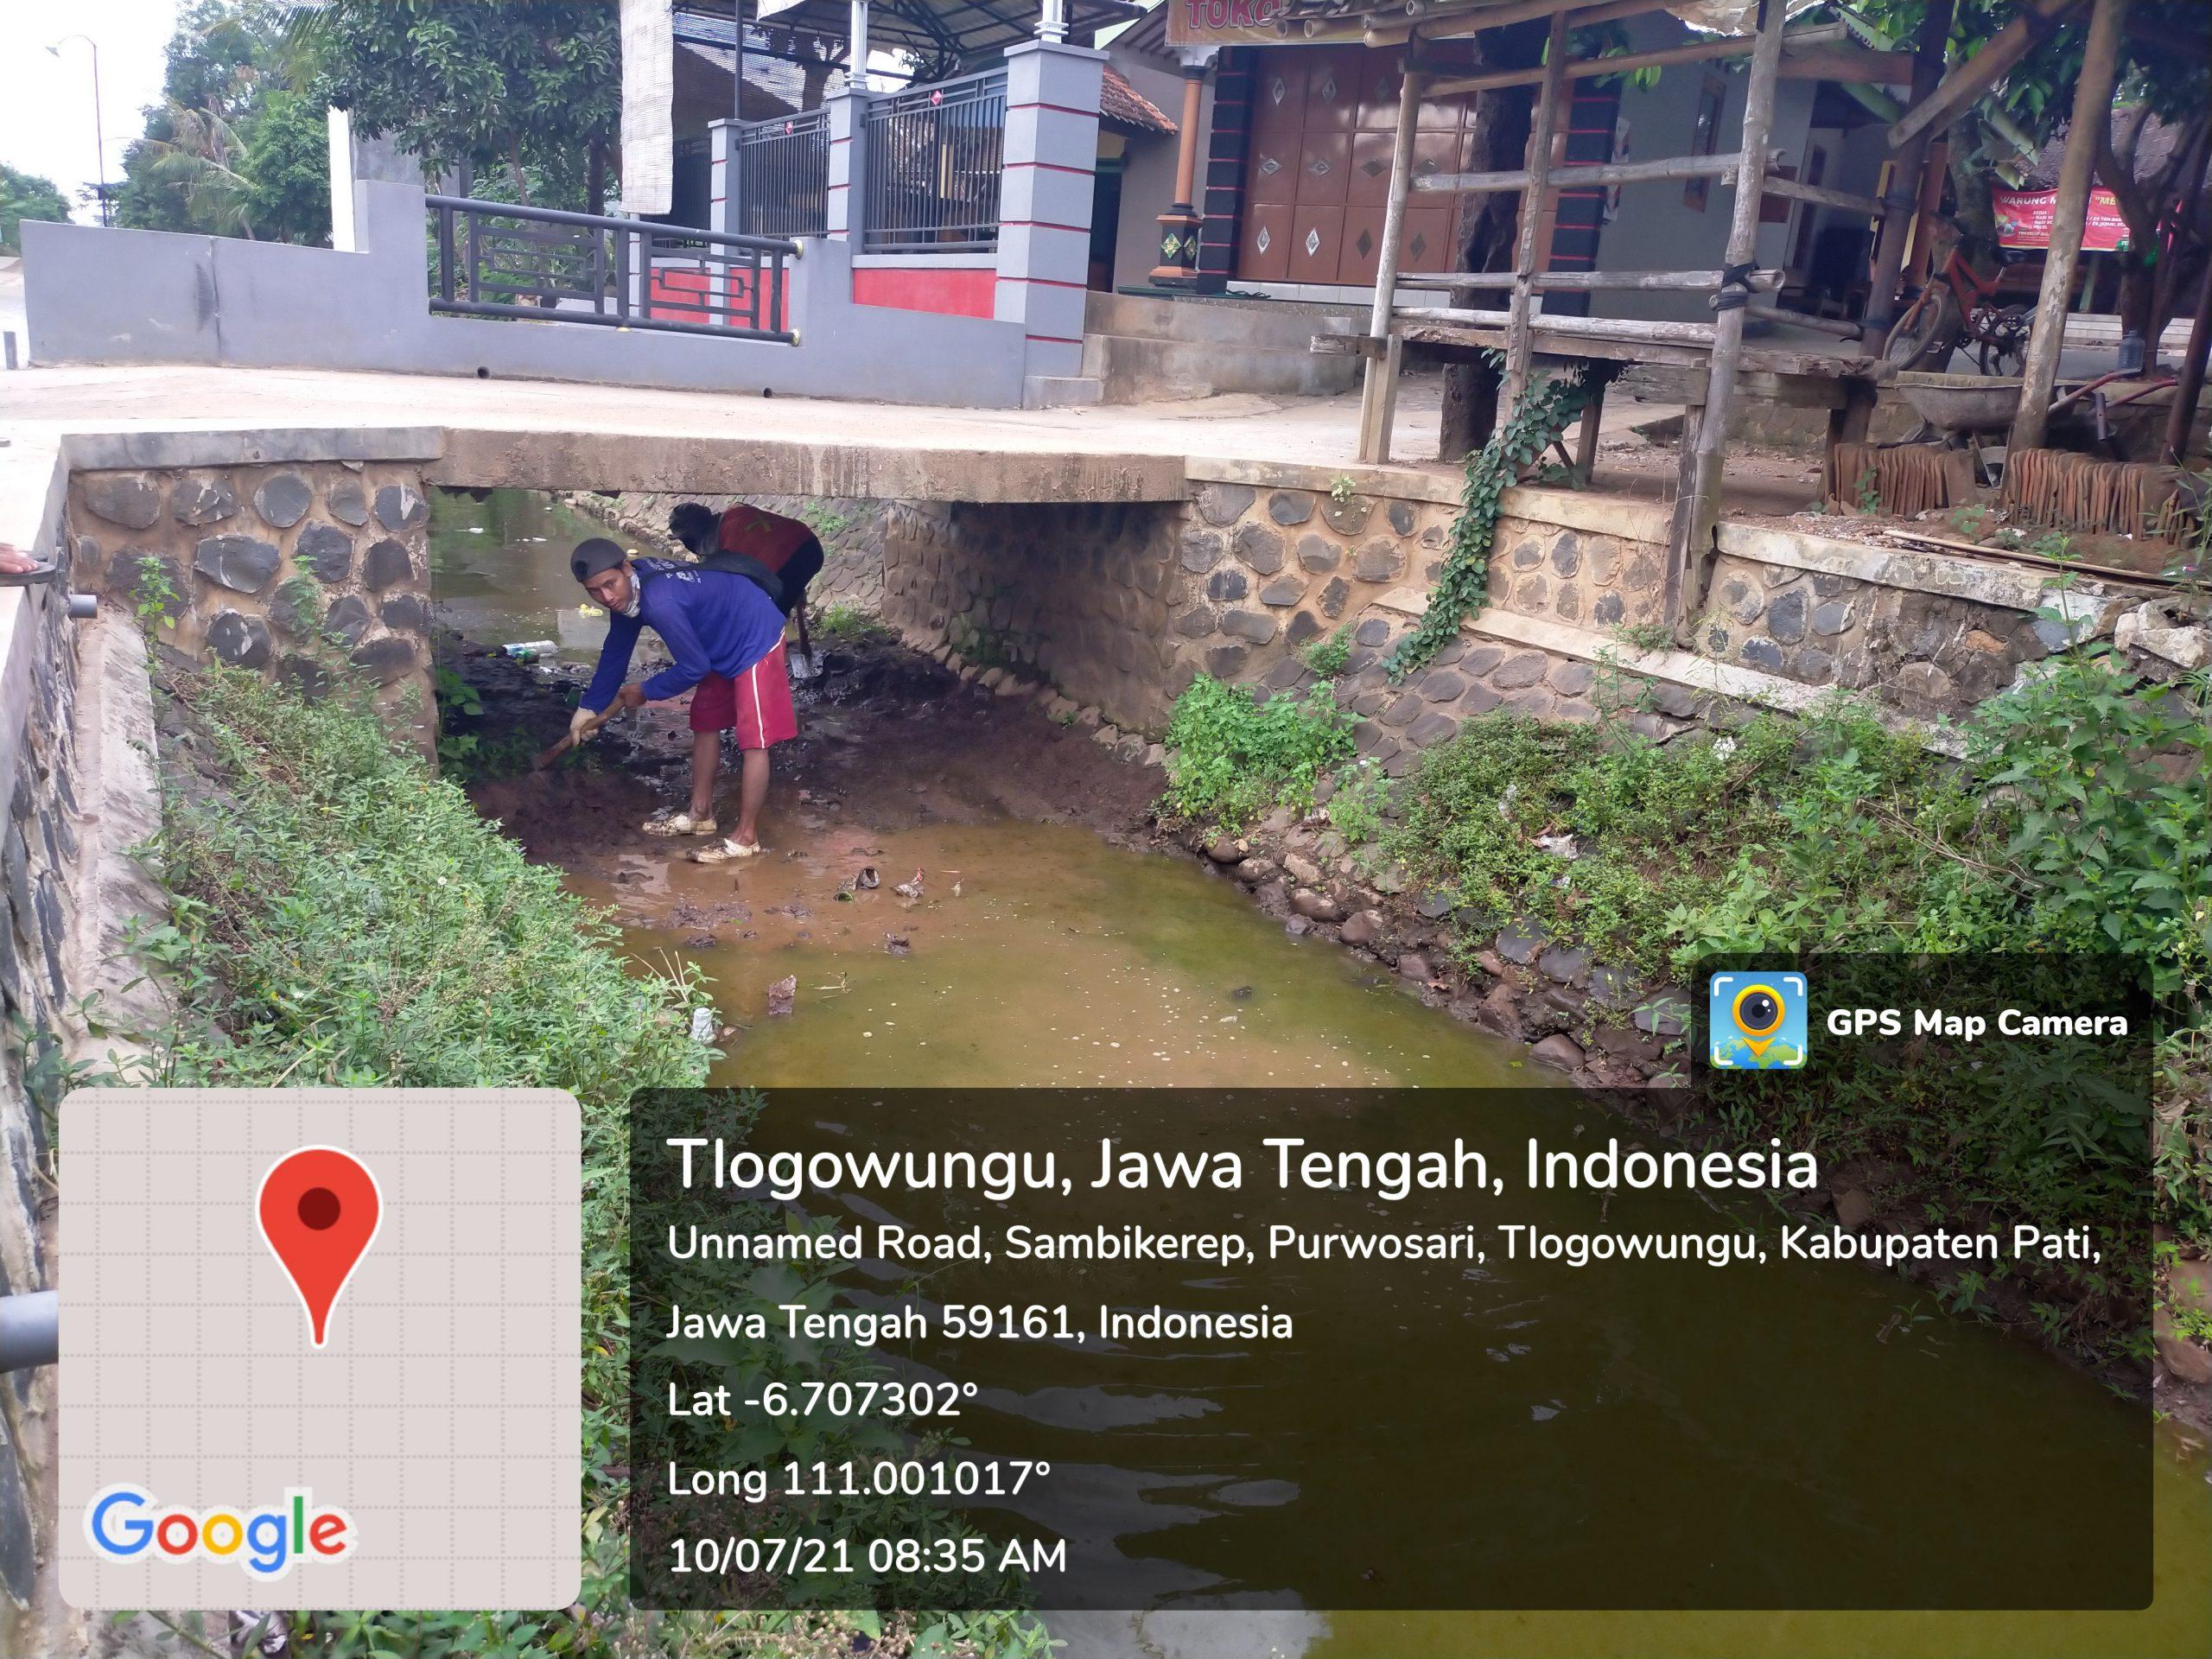 Empat Bulan Berjalan, Pihak Rekanan bawa Cangkul di Lokasi Proyek Rehabilitasi D.I Gembong TA.2021 yang Melintasi Pemukiman Warga